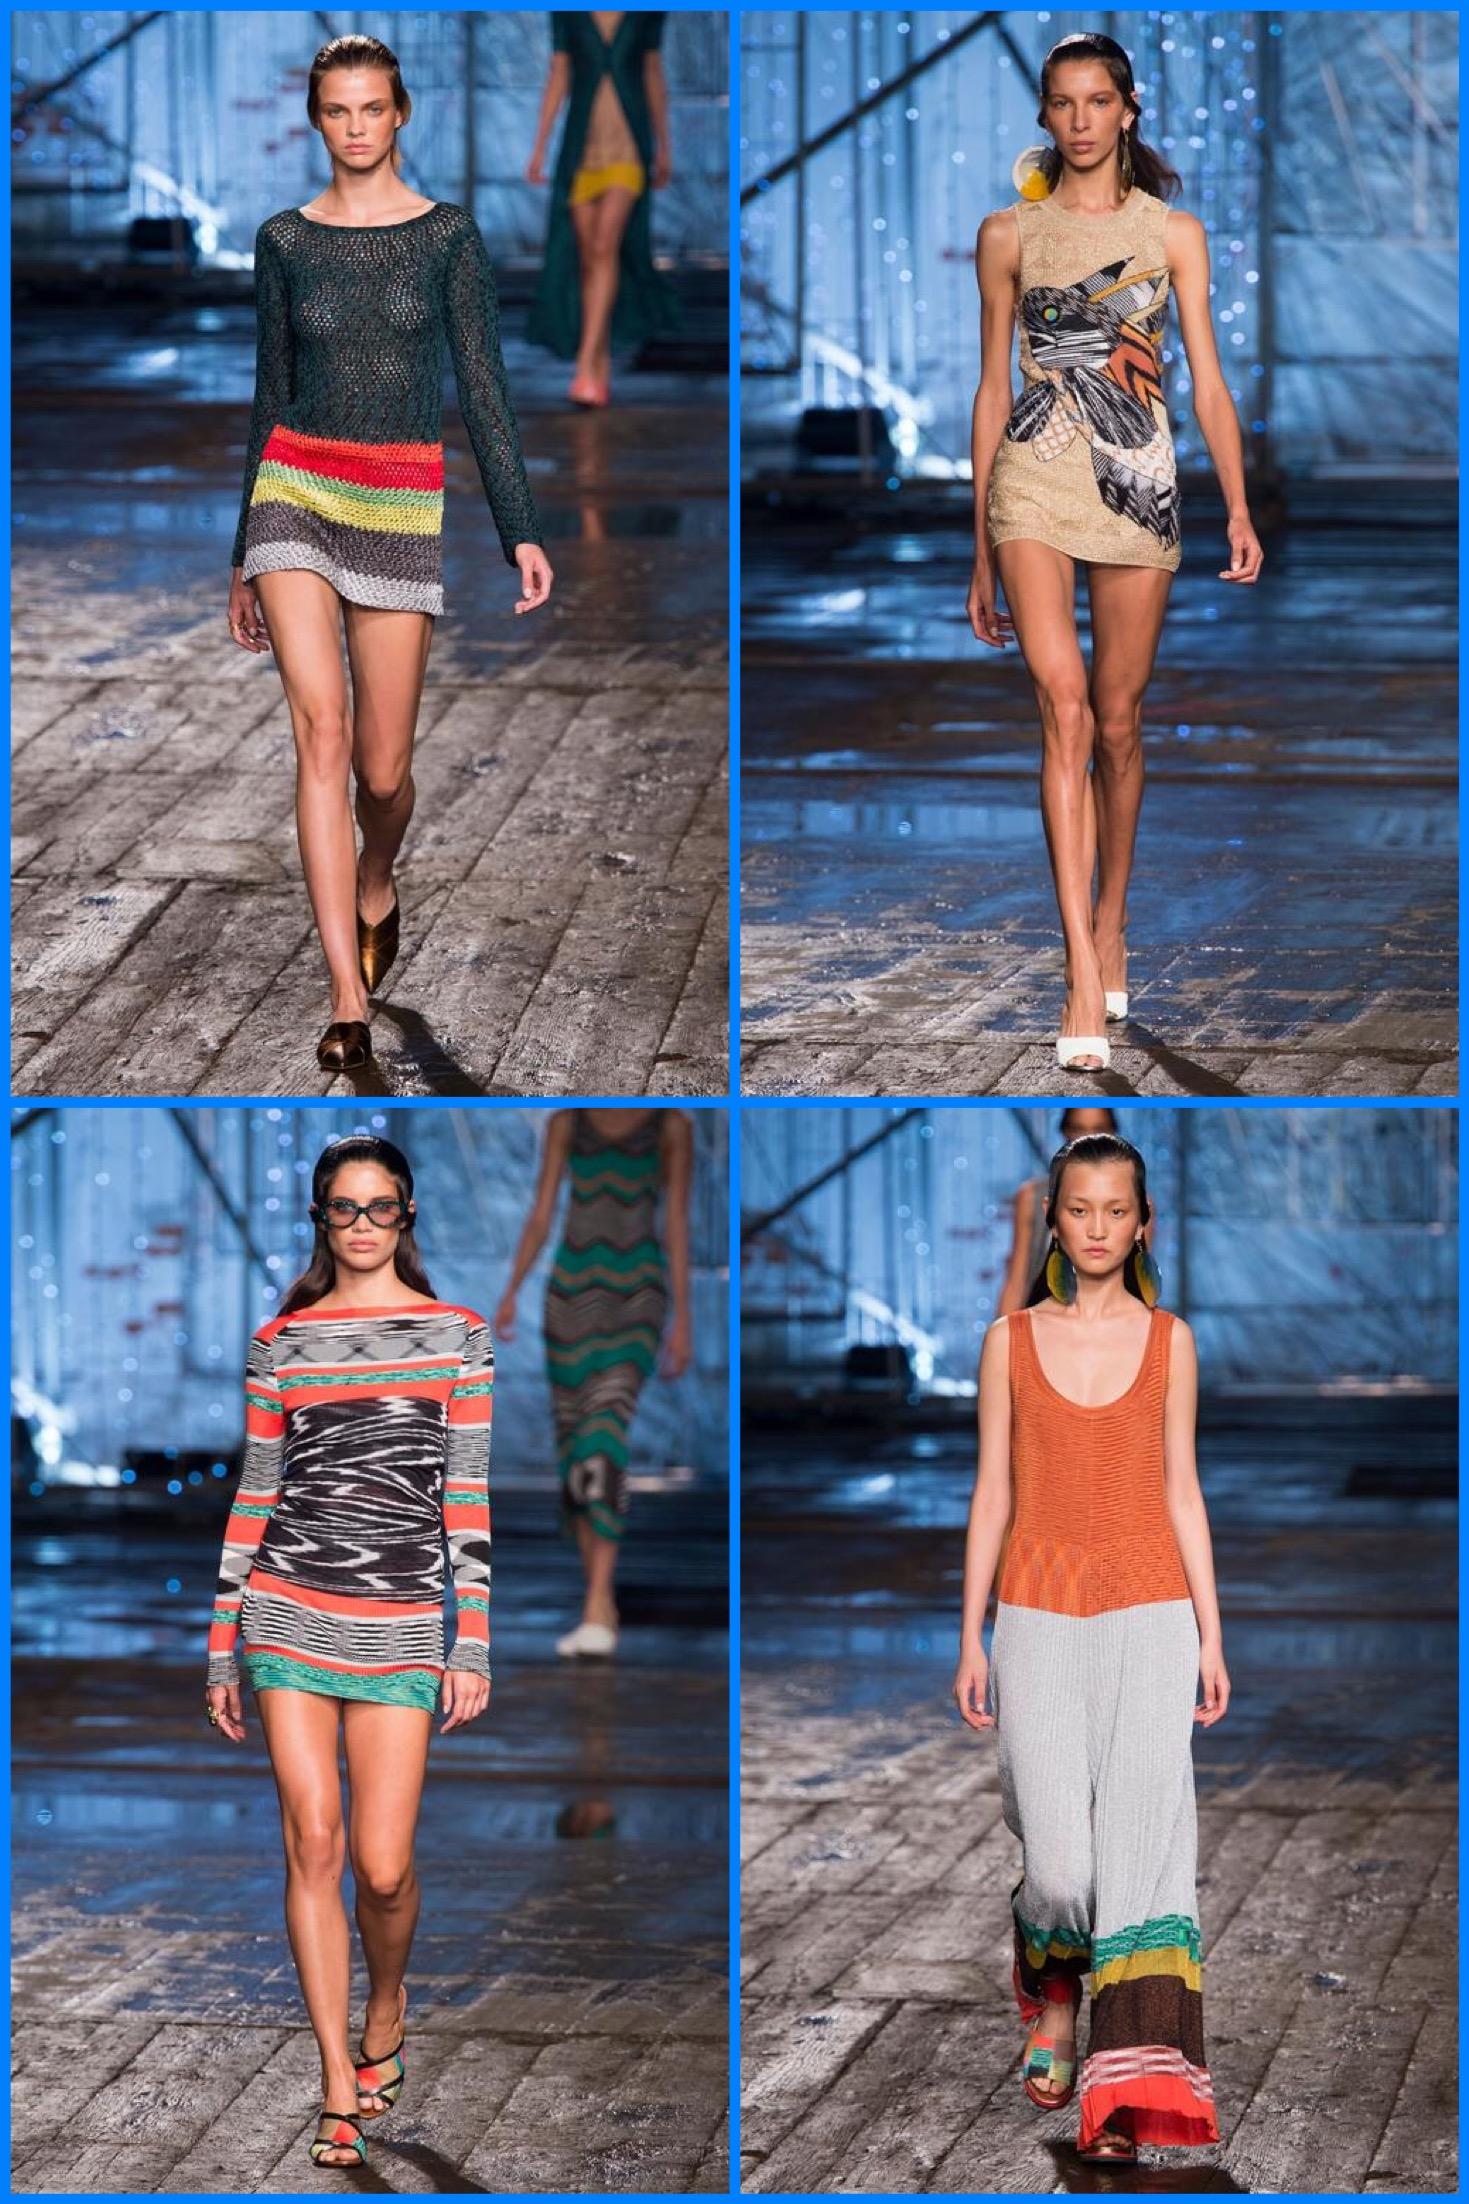 milano-fashion-week-pret-a-porter-spring-summer-2017-style-missoni